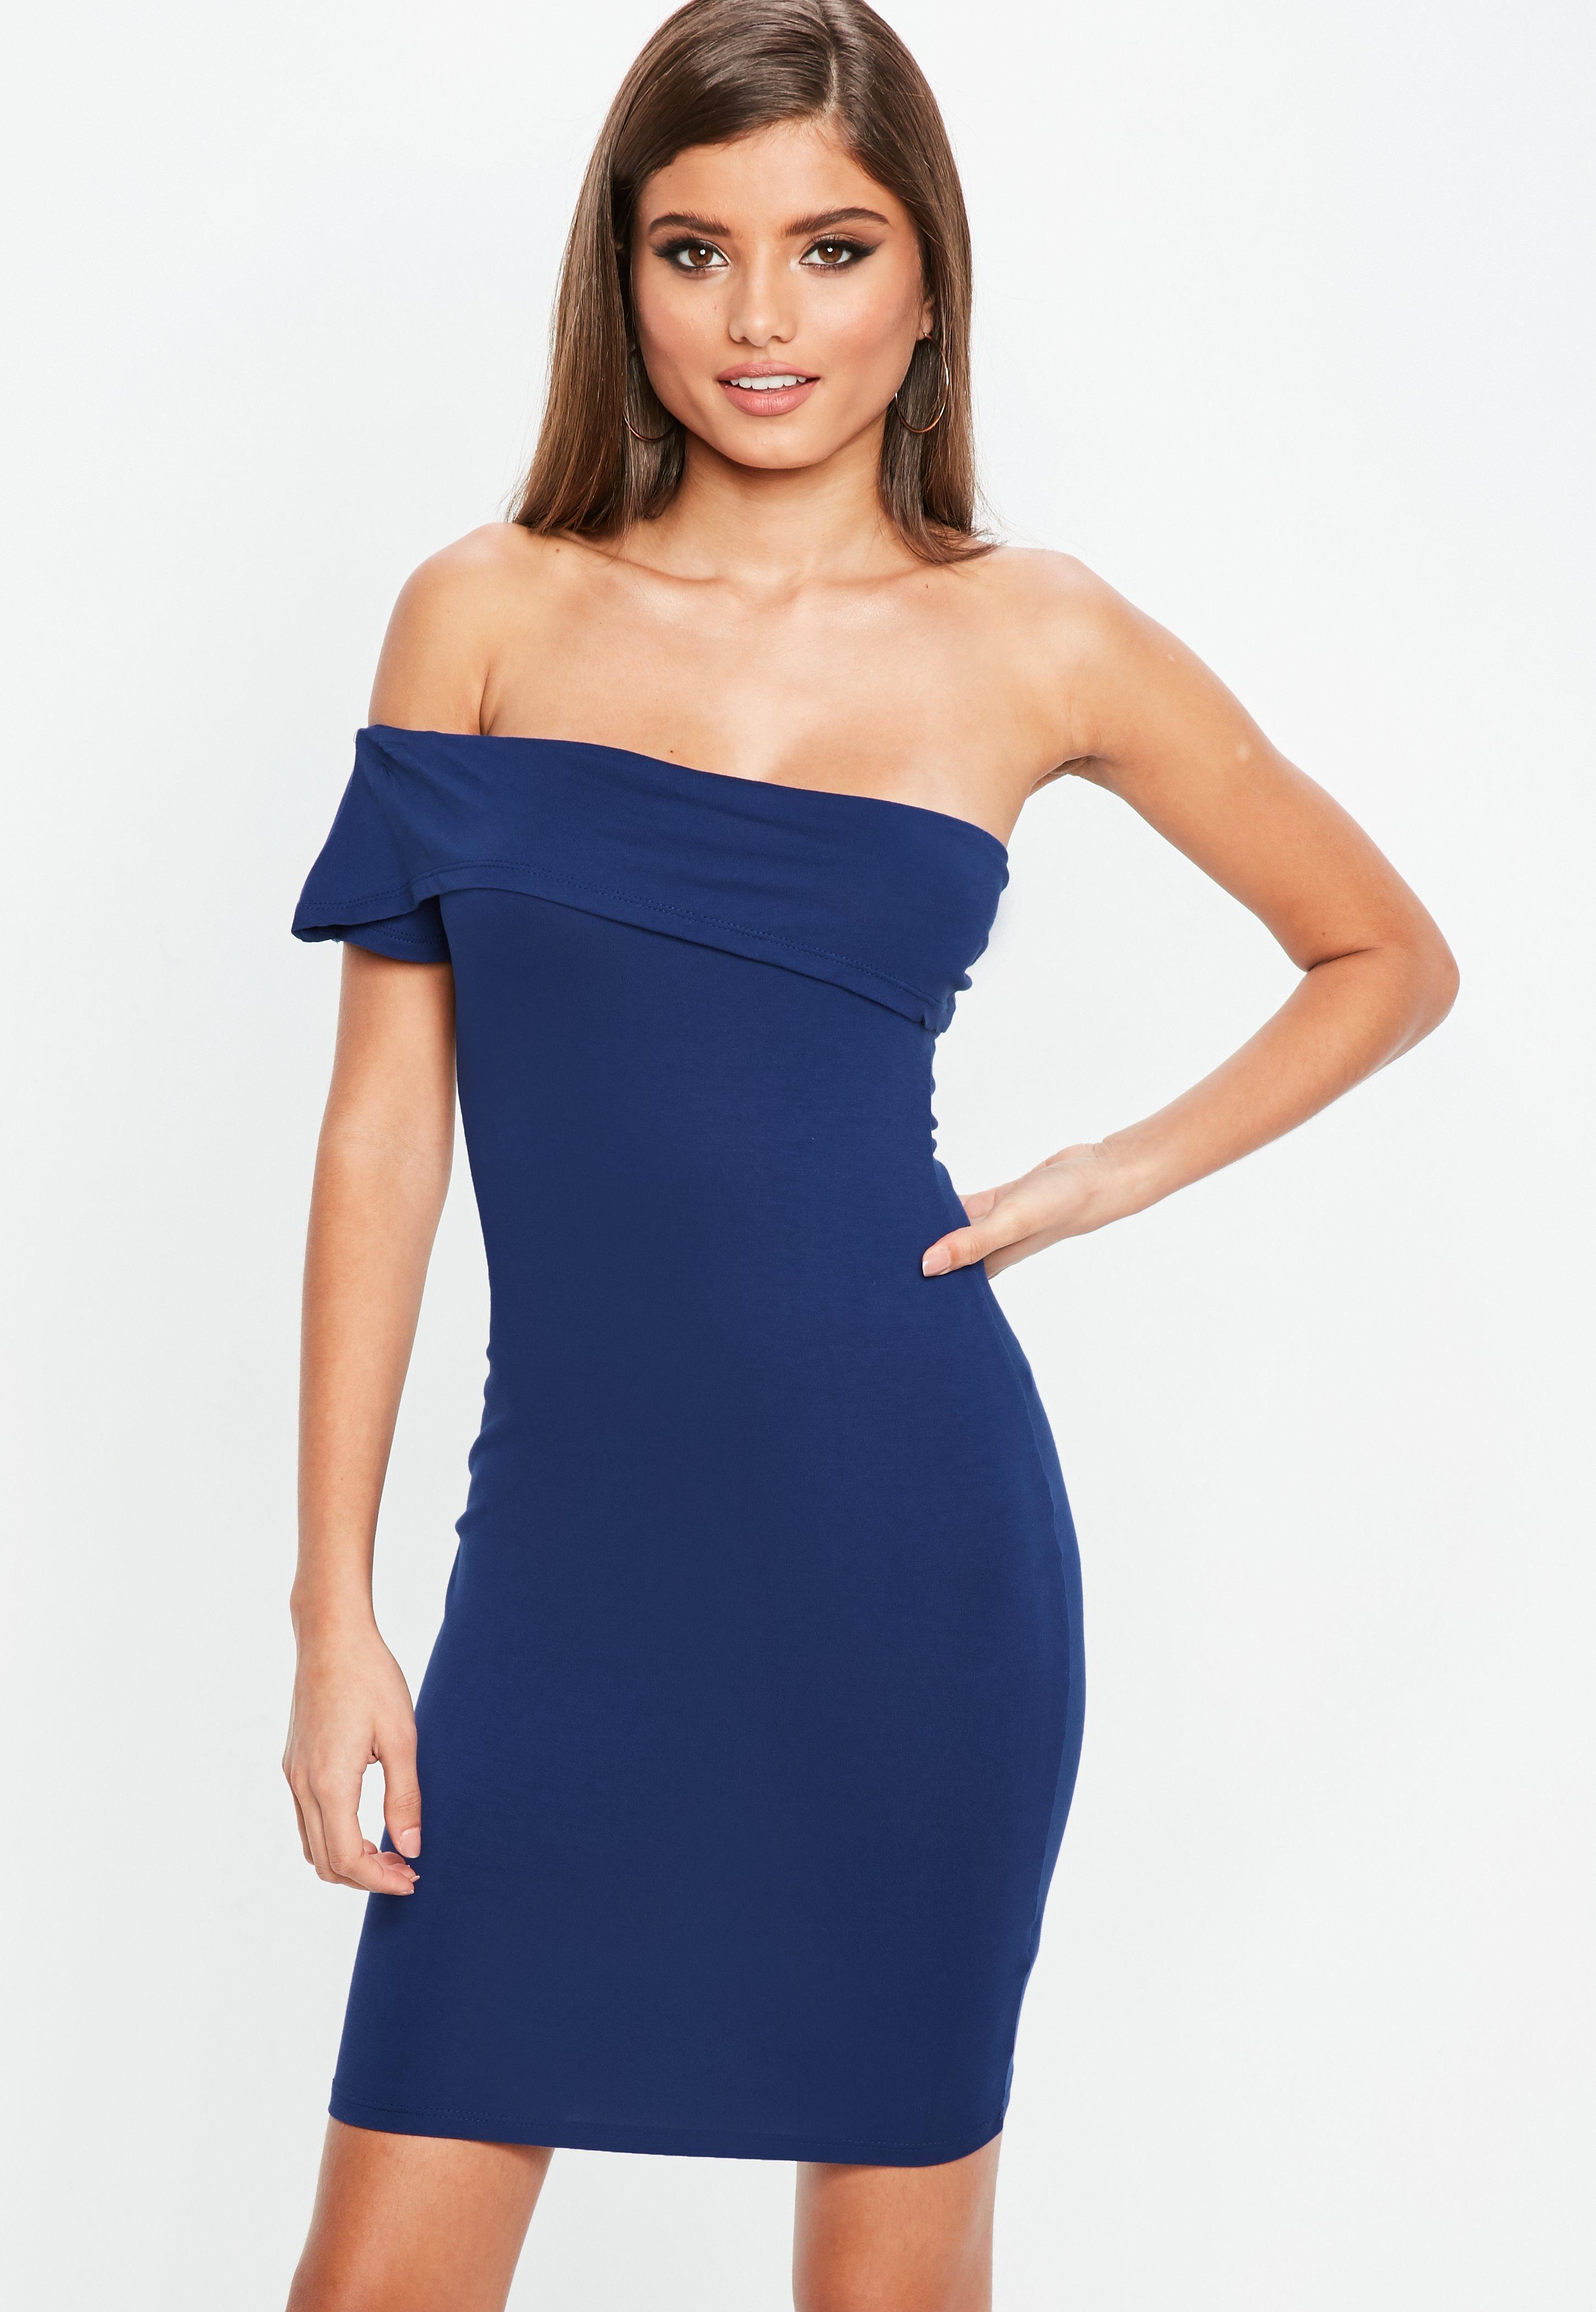 Blue Dresses - Navy, Royal Blue & Cobalt Dresses - Missguided